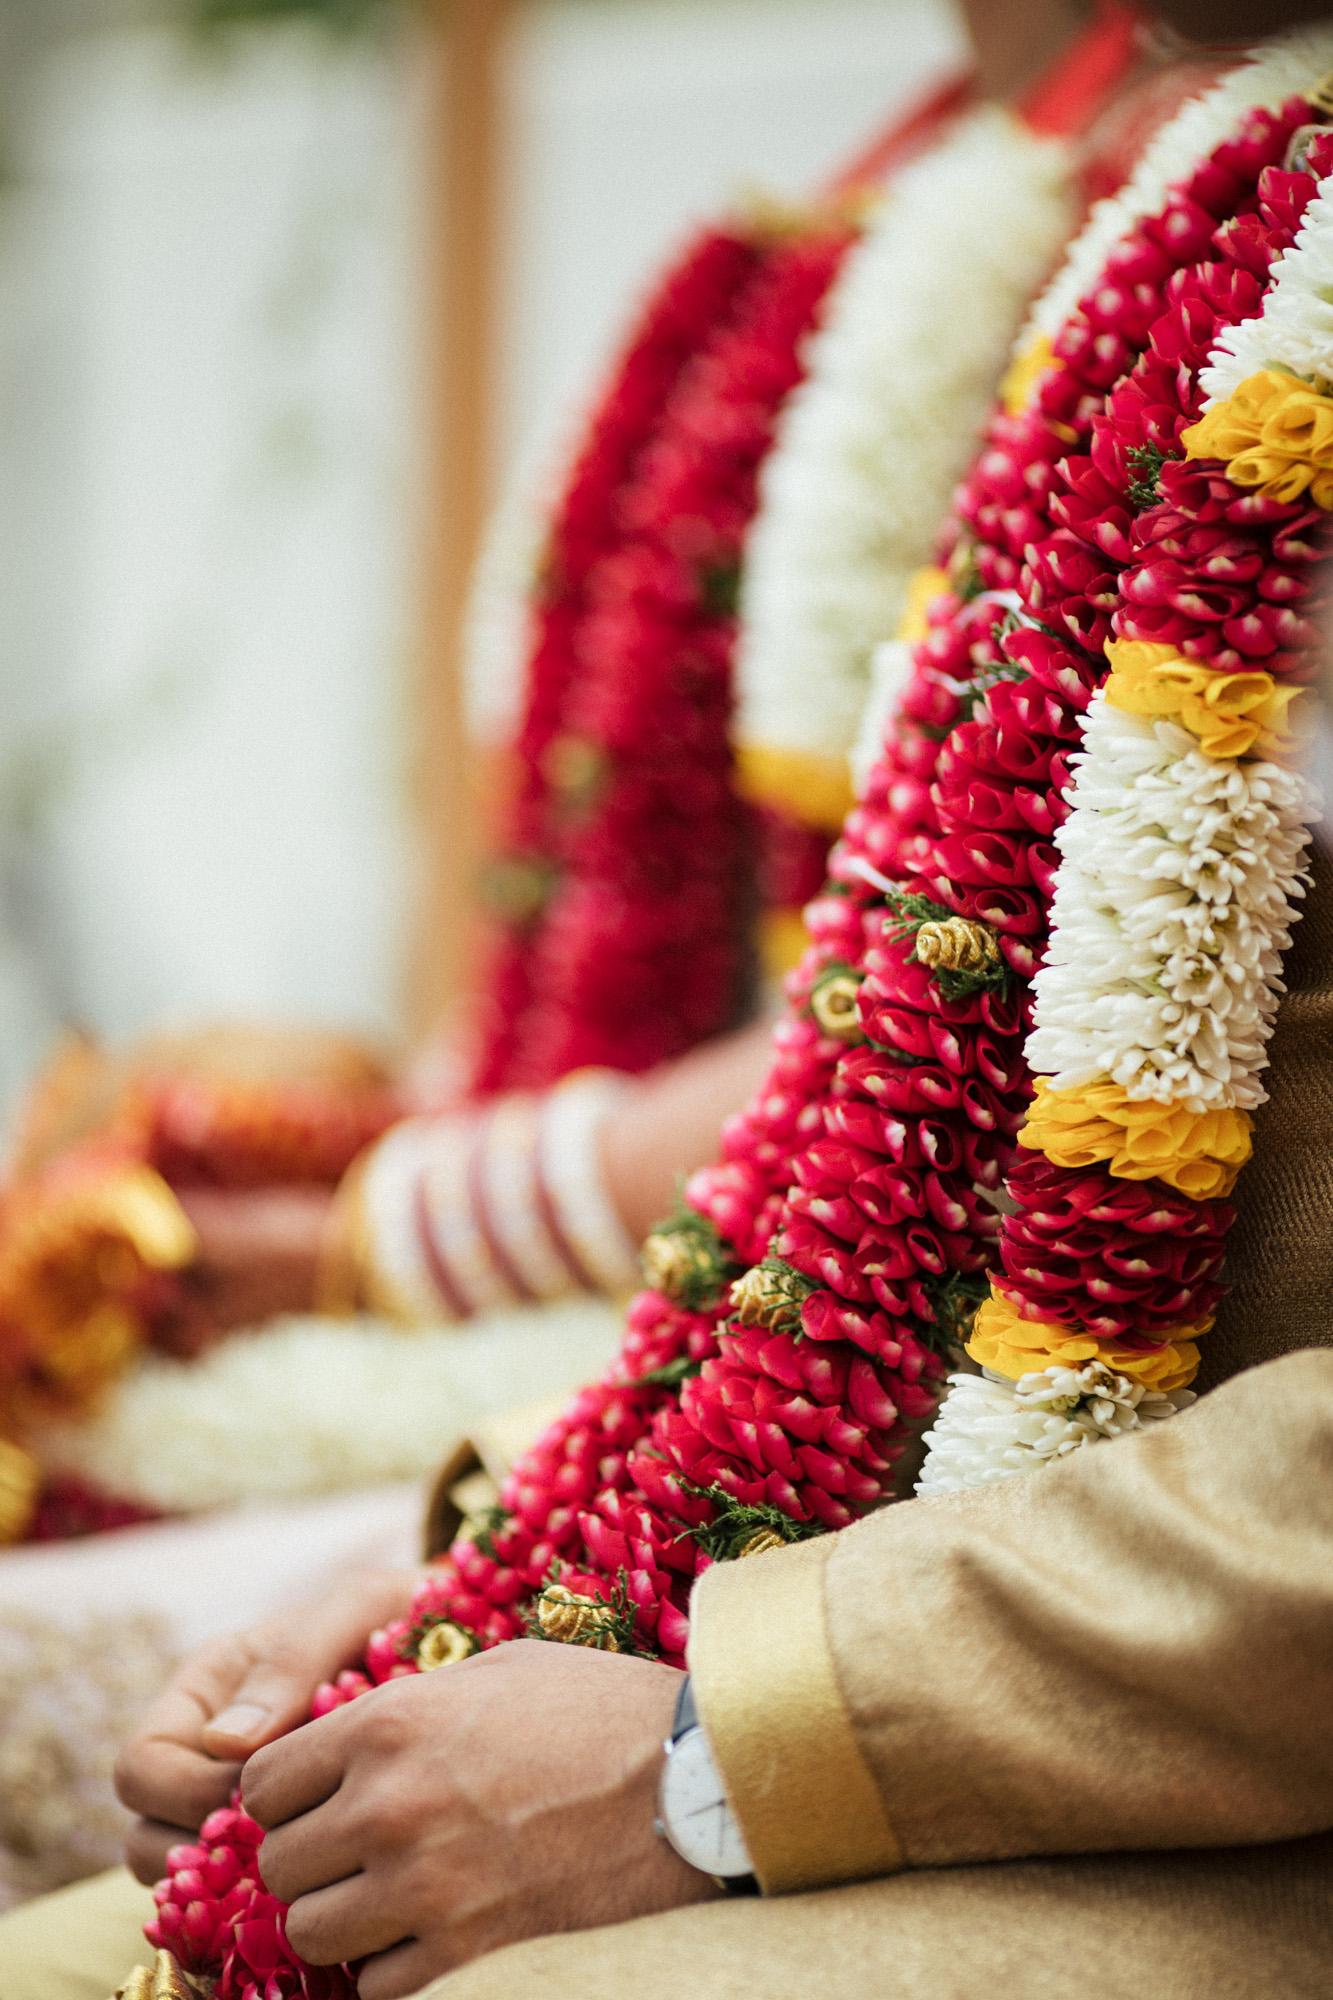 anu_maneesh_alec_vanderboom_Indian_wedding_photography-0105.jpg